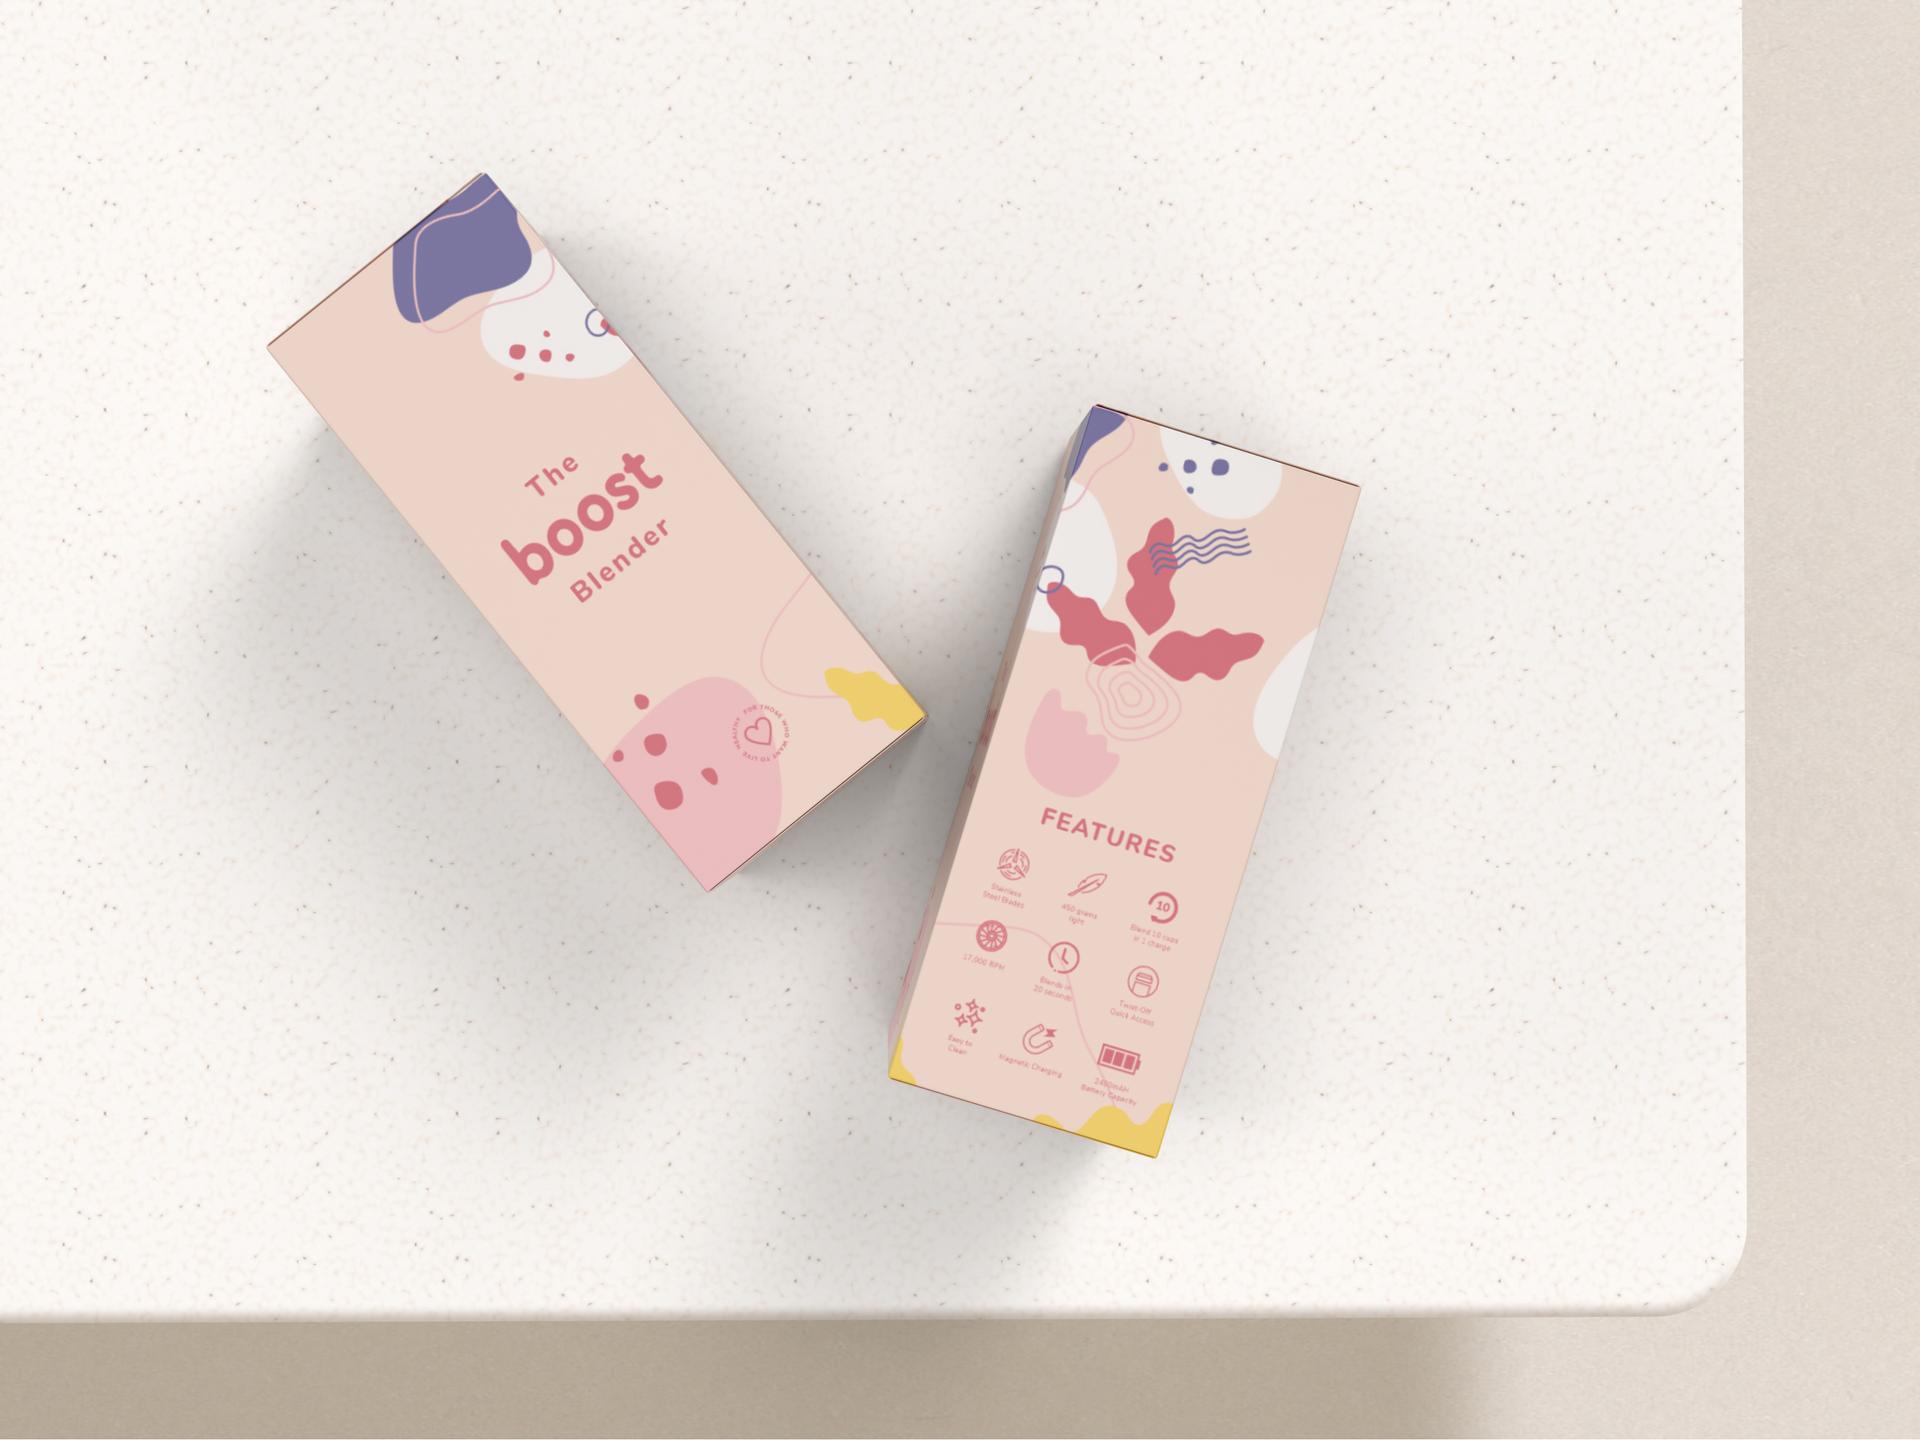 BoostBlender-Packaging-PINK_02.png